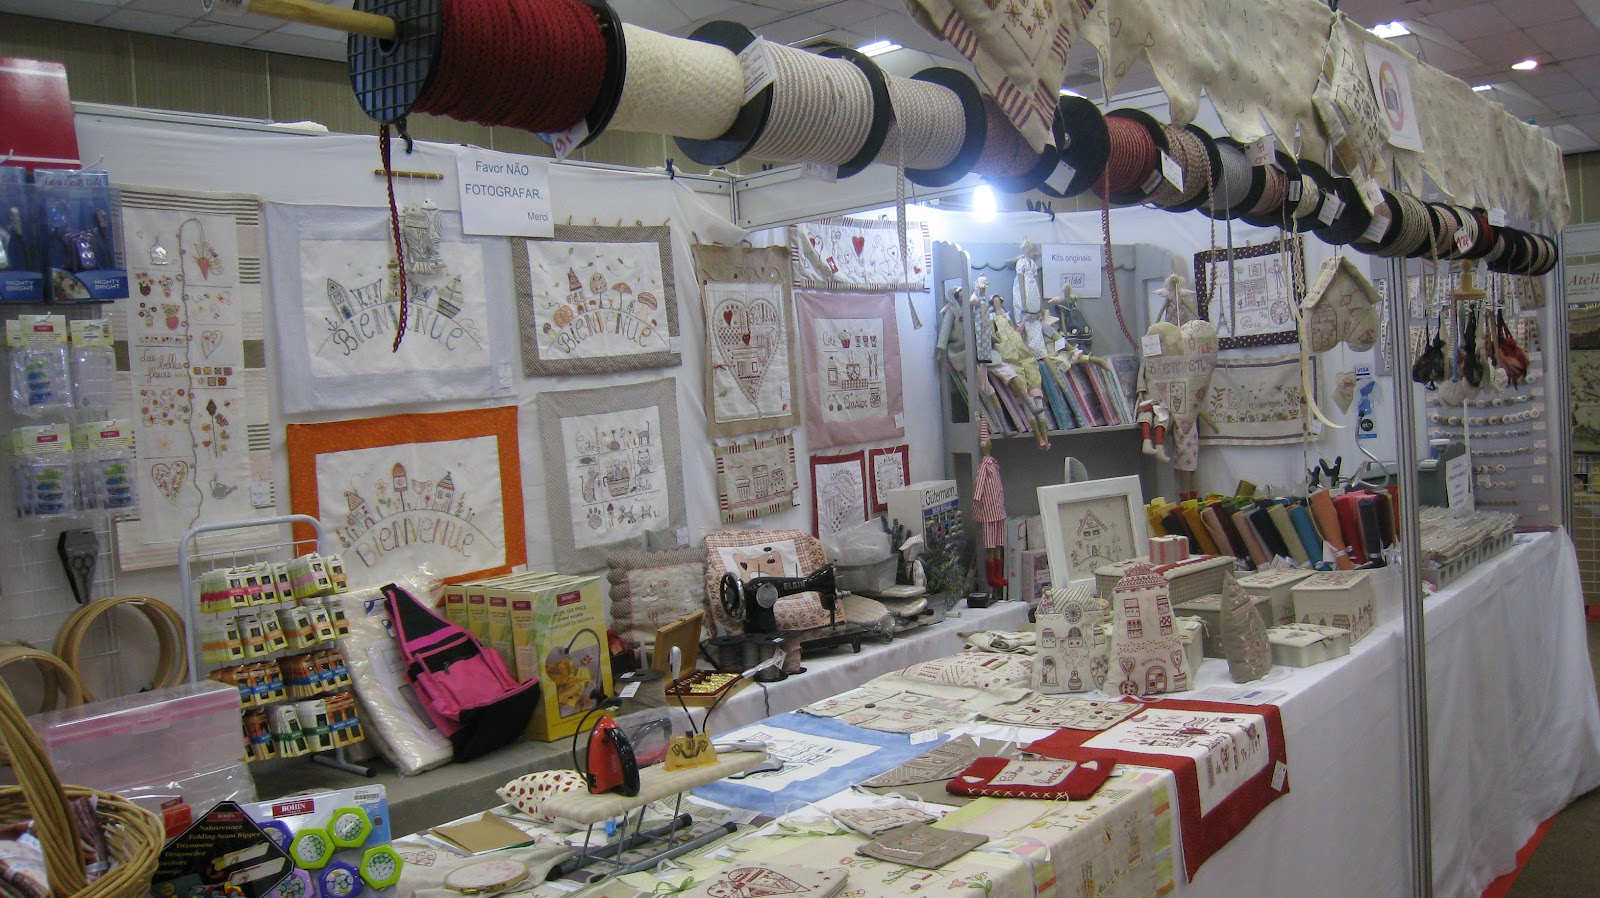 Salones Con Aparador Y Vitrina ~ Le Petit Atelier Florianópolis Feira Algod u00e3o Doce Festival de Artesanato